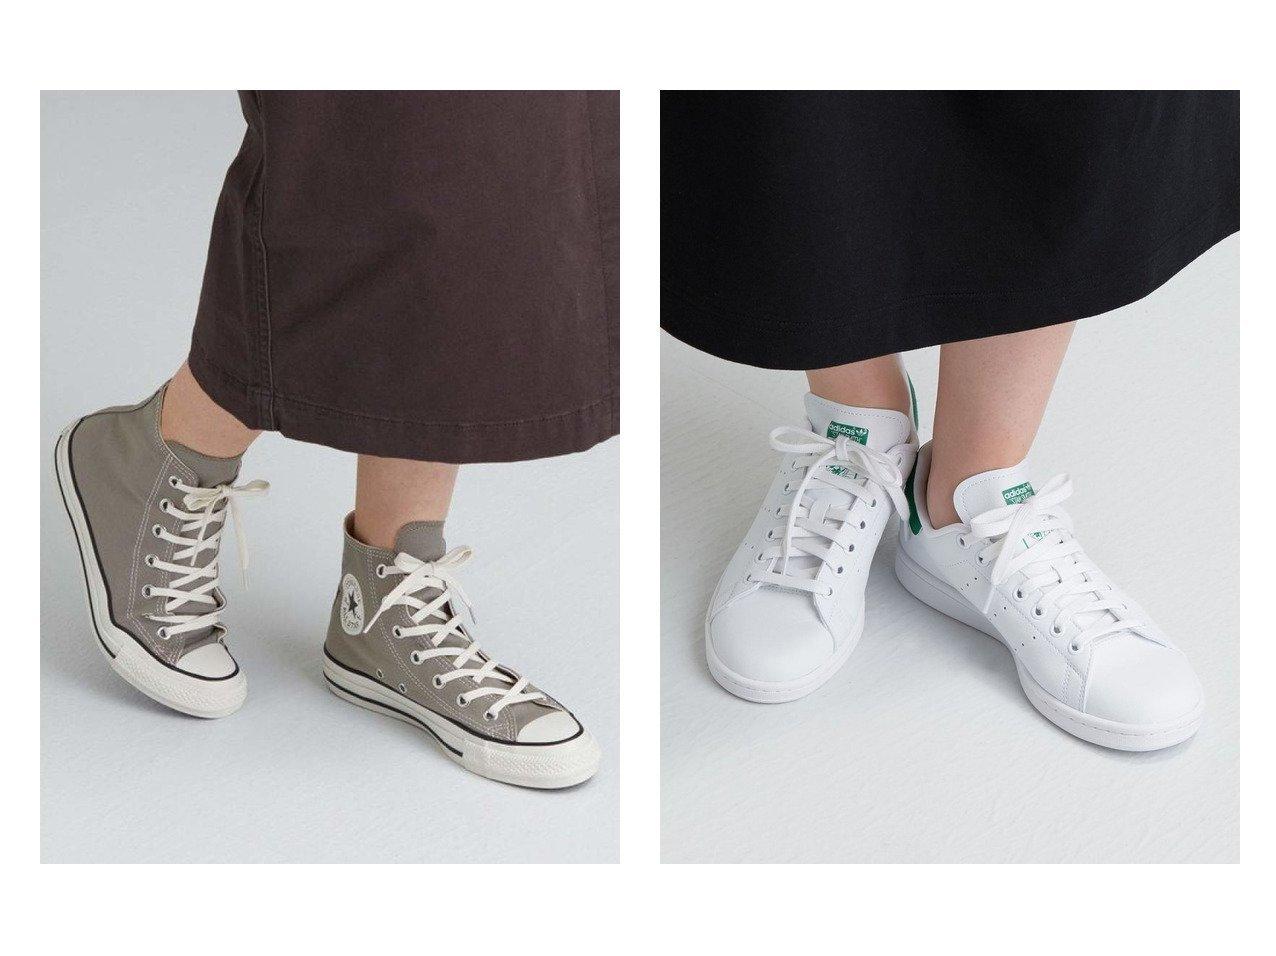 【green label relaxing / UNITED ARROWS/グリーンレーベル リラクシング / ユナイテッドアローズ】のコンバース CONVERSE SC FOODTEXTILE スニーカー&アディダス adidas SC STANSMITH ヴィーガン スニーカー シューズ・靴のおすすめ!人気、トレンド・レディースファッションの通販 おすすめで人気の流行・トレンド、ファッションの通販商品 メンズファッション・キッズファッション・インテリア・家具・レディースファッション・服の通販 founy(ファニー) https://founy.com/ ファッション Fashion レディースファッション WOMEN インソール キャンバス コーデュロイ 今季 シューズ スニーカー スリッポン ターコイズ プリント ラバー シャツワンピ シンプル 人気 プリーツ  ID:crp329100000012460